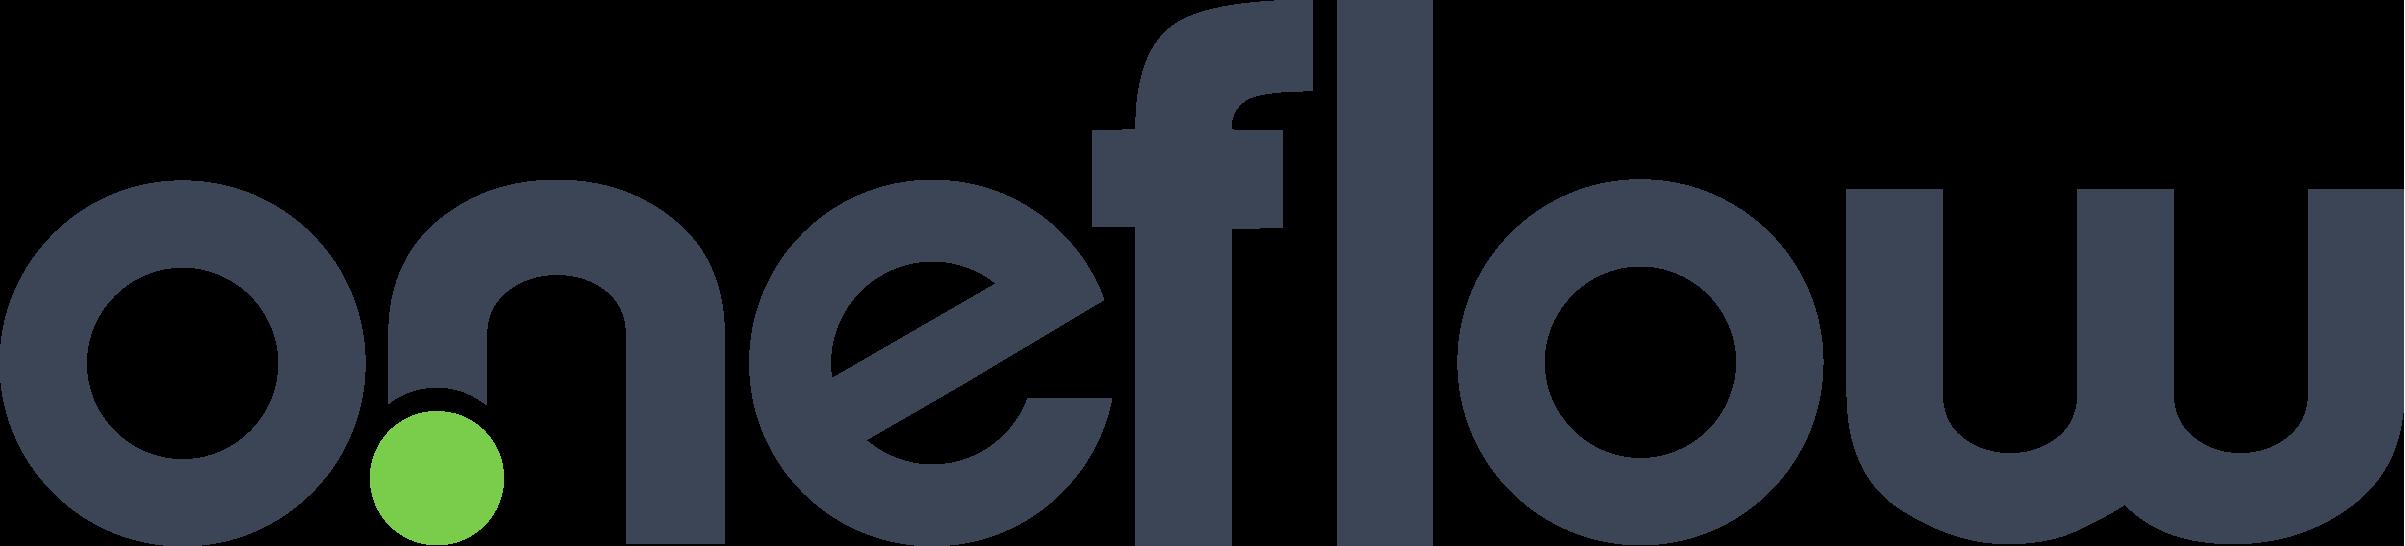 Oneflow logo